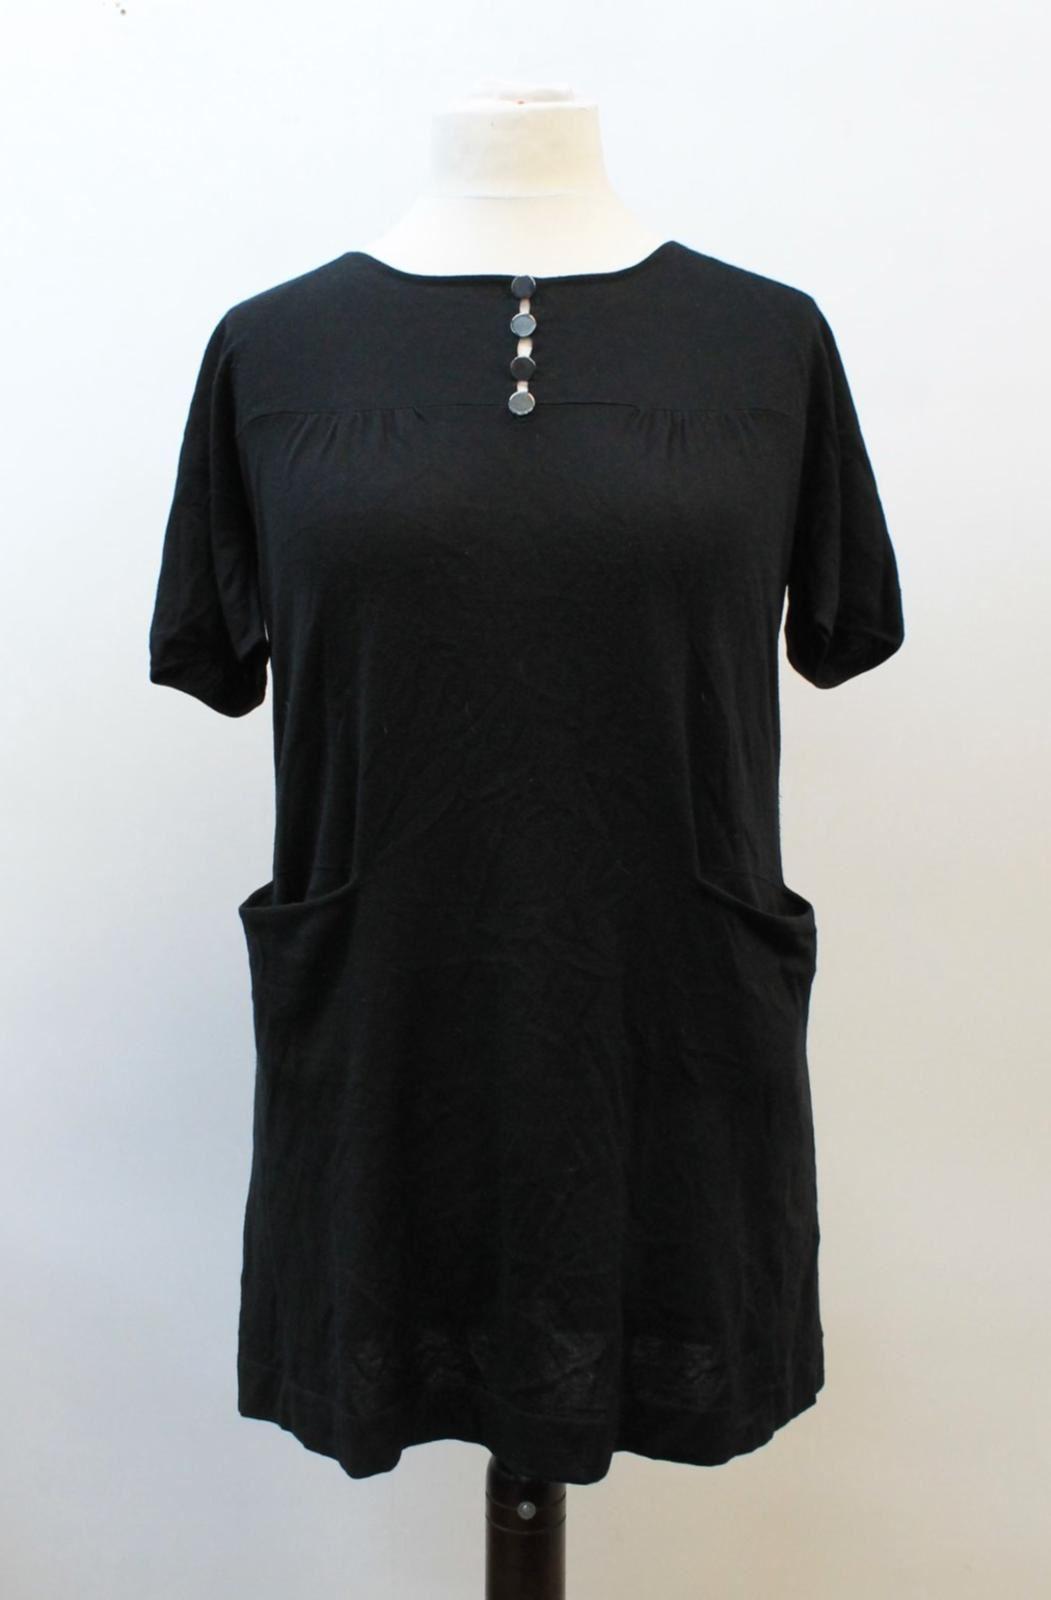 MAJE-Ladies-Black-Silk-Cashmere-Blend-Short-Sleeved-Boat-Neck-Tunic-Dress-L